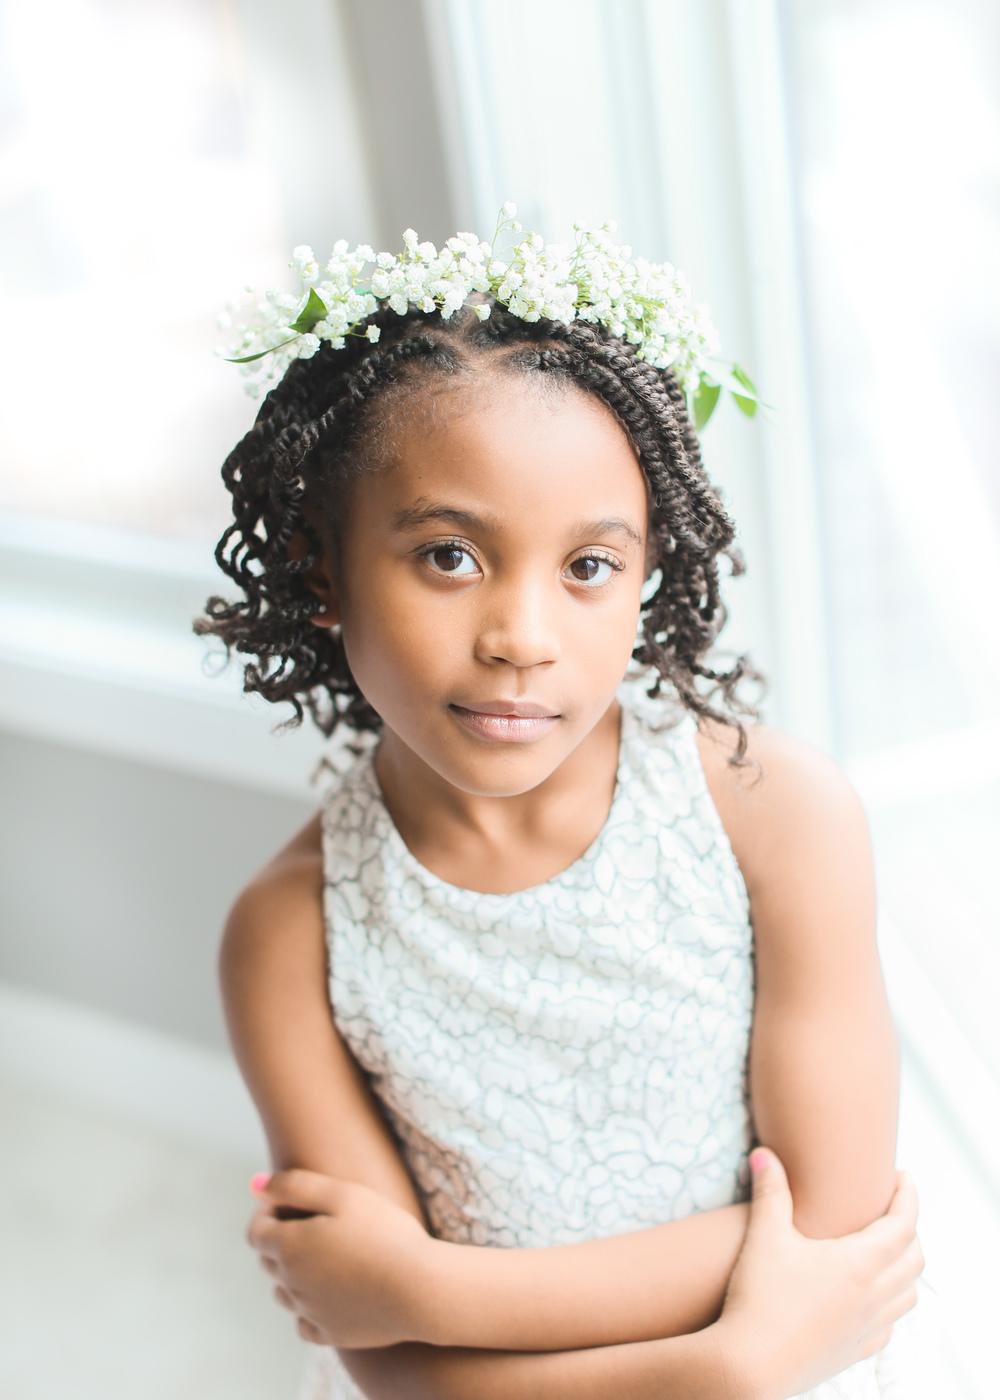 little-girl-portrait-big-eyes